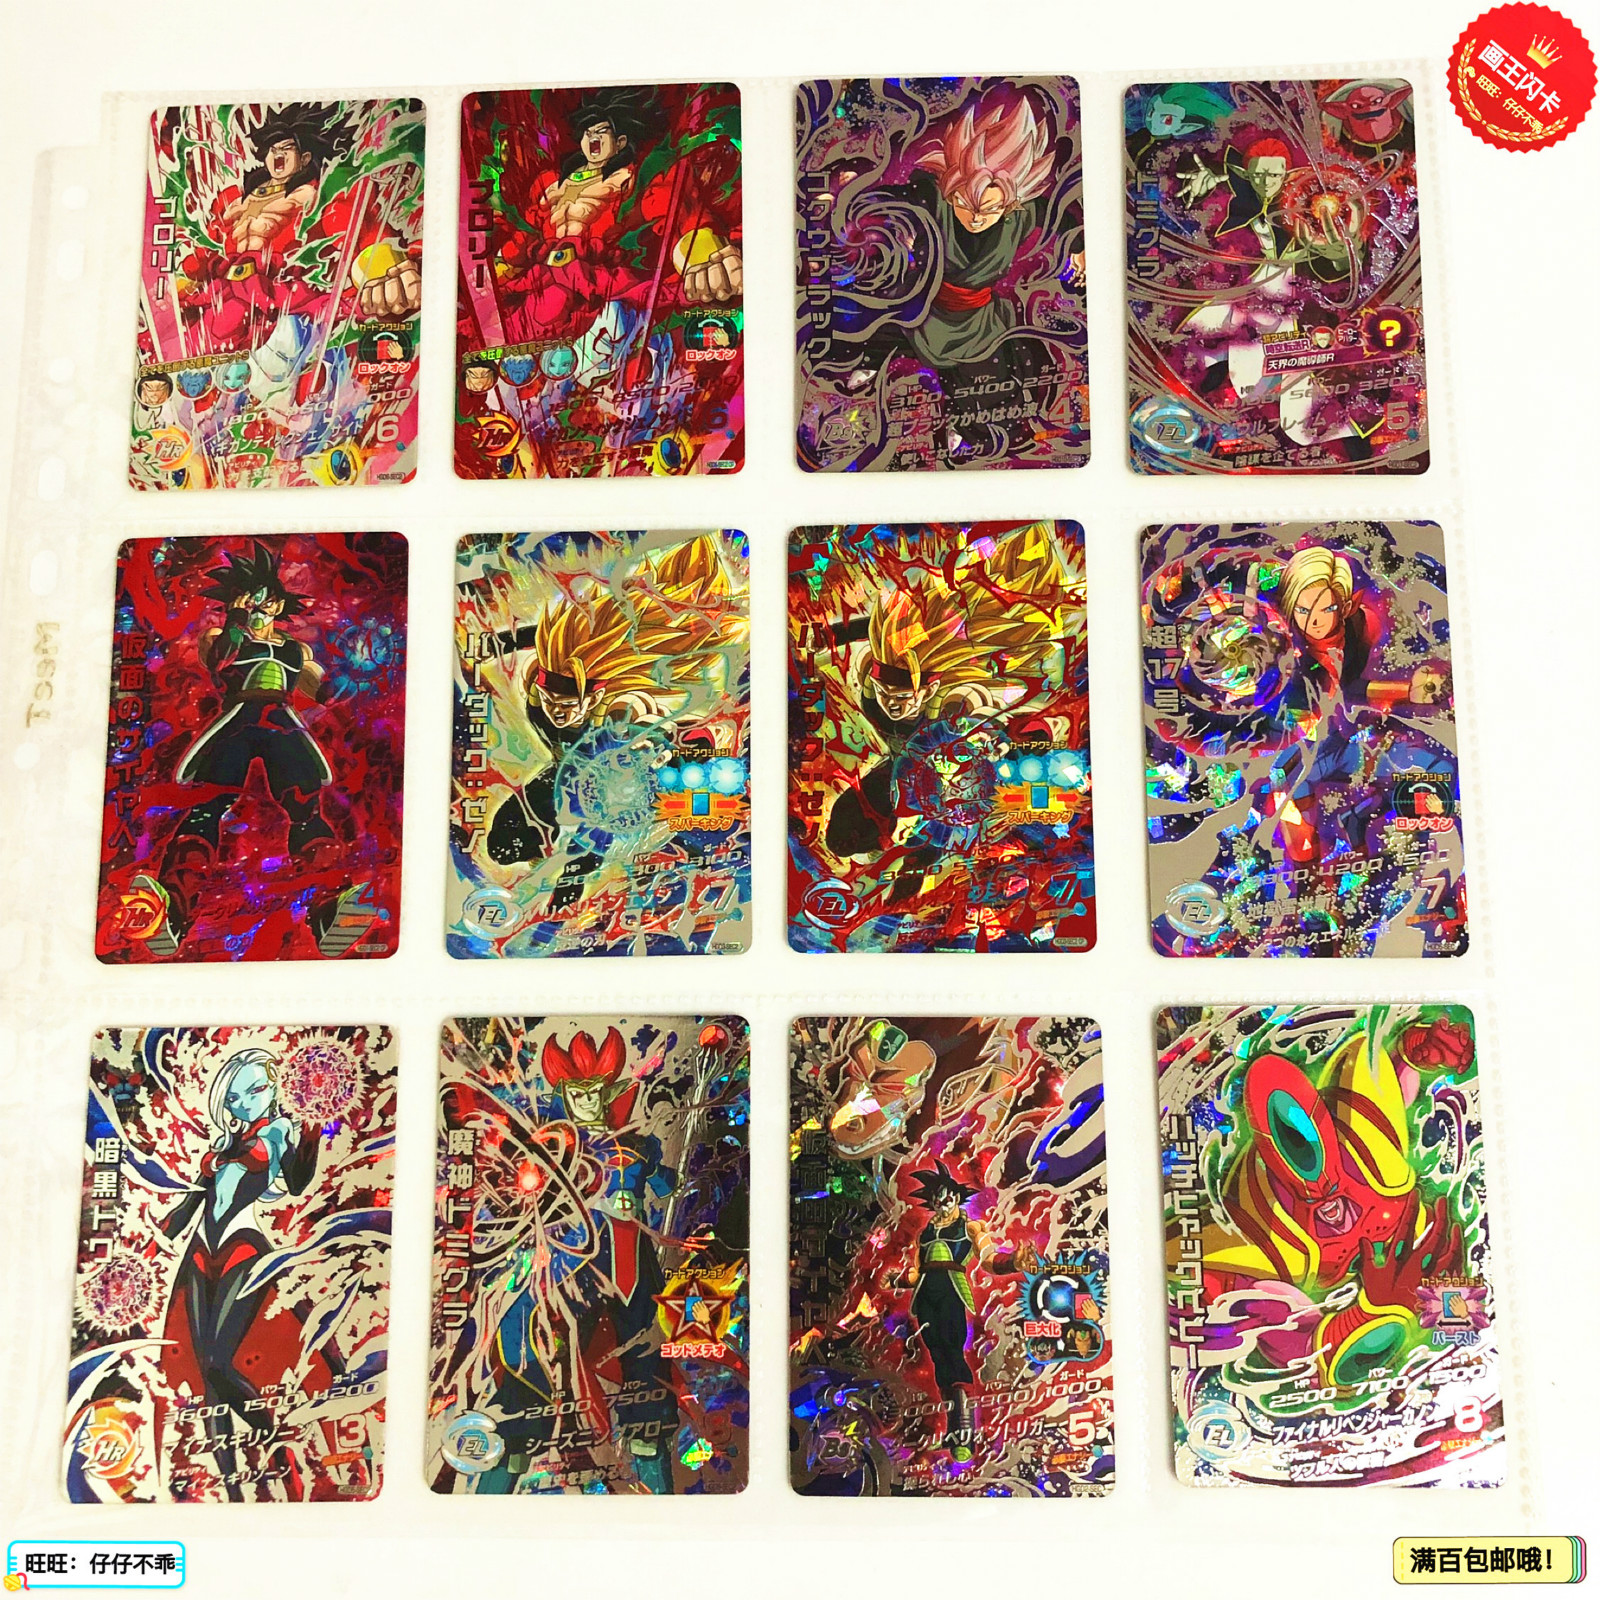 Japan Original Dragon Ball Hero Card SEC 4 Stars UR HGD Goku Toys Hobbies Collectibles Game Collection Anime Cards